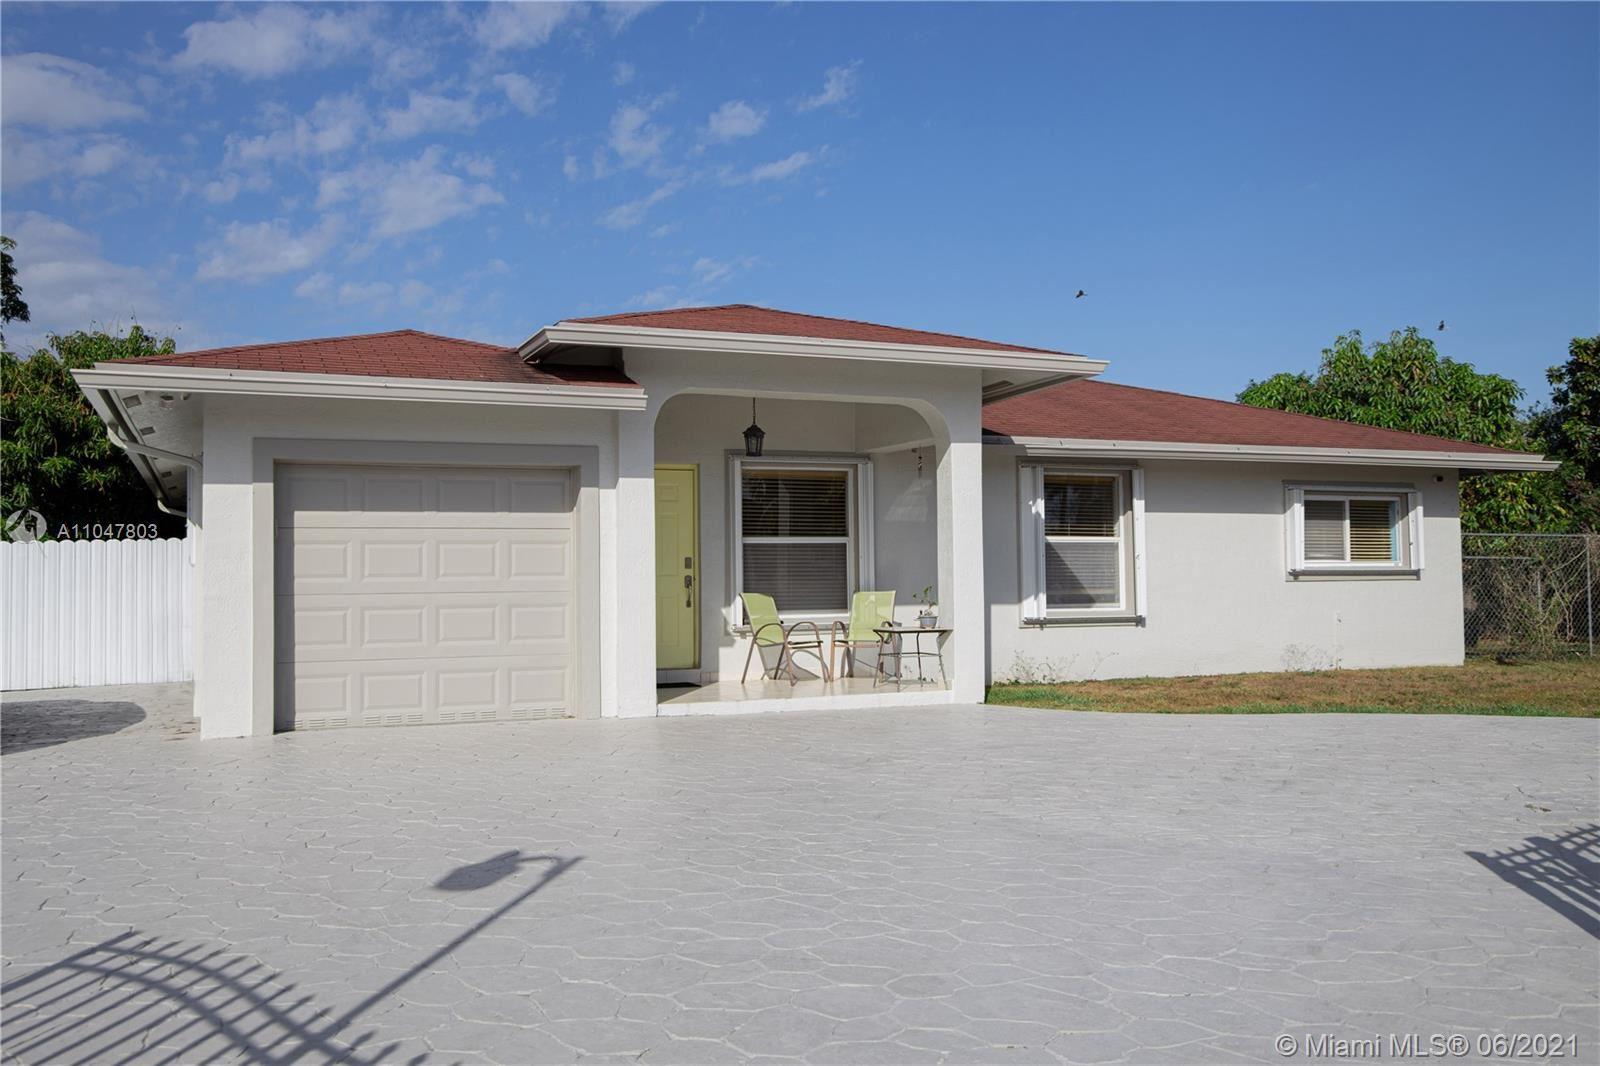 26301 SW 133rd Ct, Homestead, FL 33032 - #: A11047803